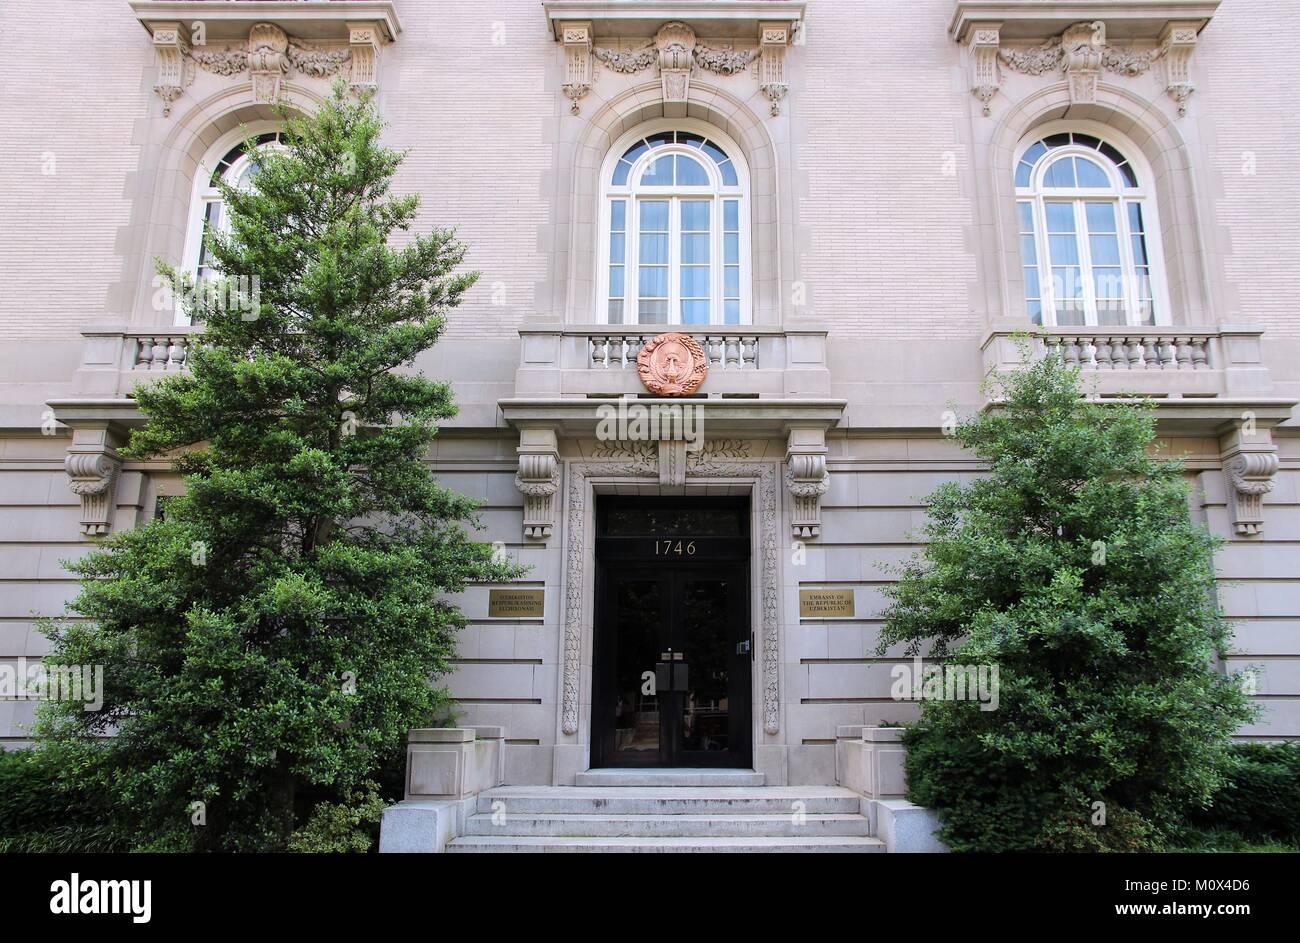 WASHINGTON - JUNE 14: Embassy of the Republic of Uzbekistan on June 14, 2013 in Washington. It is part of famous - Stock Image